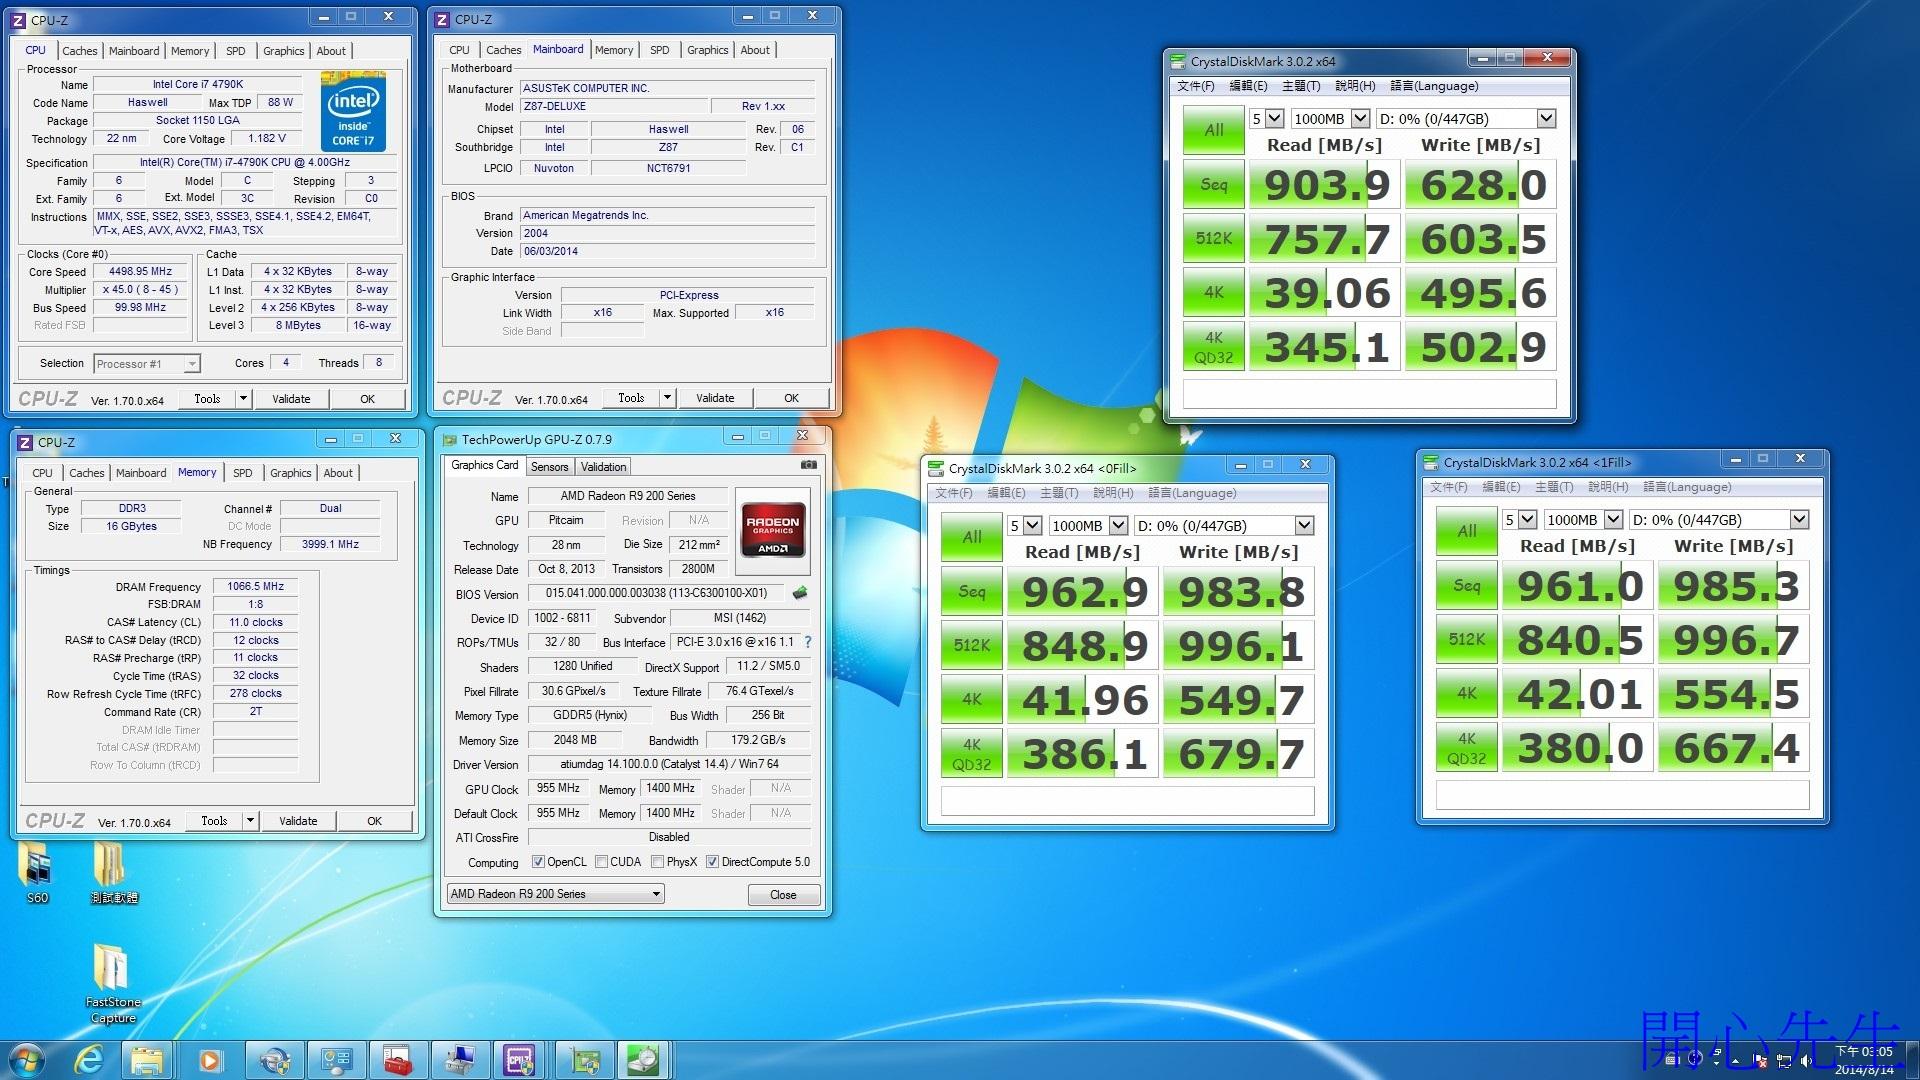 SSD RAID更帶勁! 廣穎 Silicon Power Slim S60 240GB RAID 0開箱測試 | T17 討論區 - 一起分享好東西